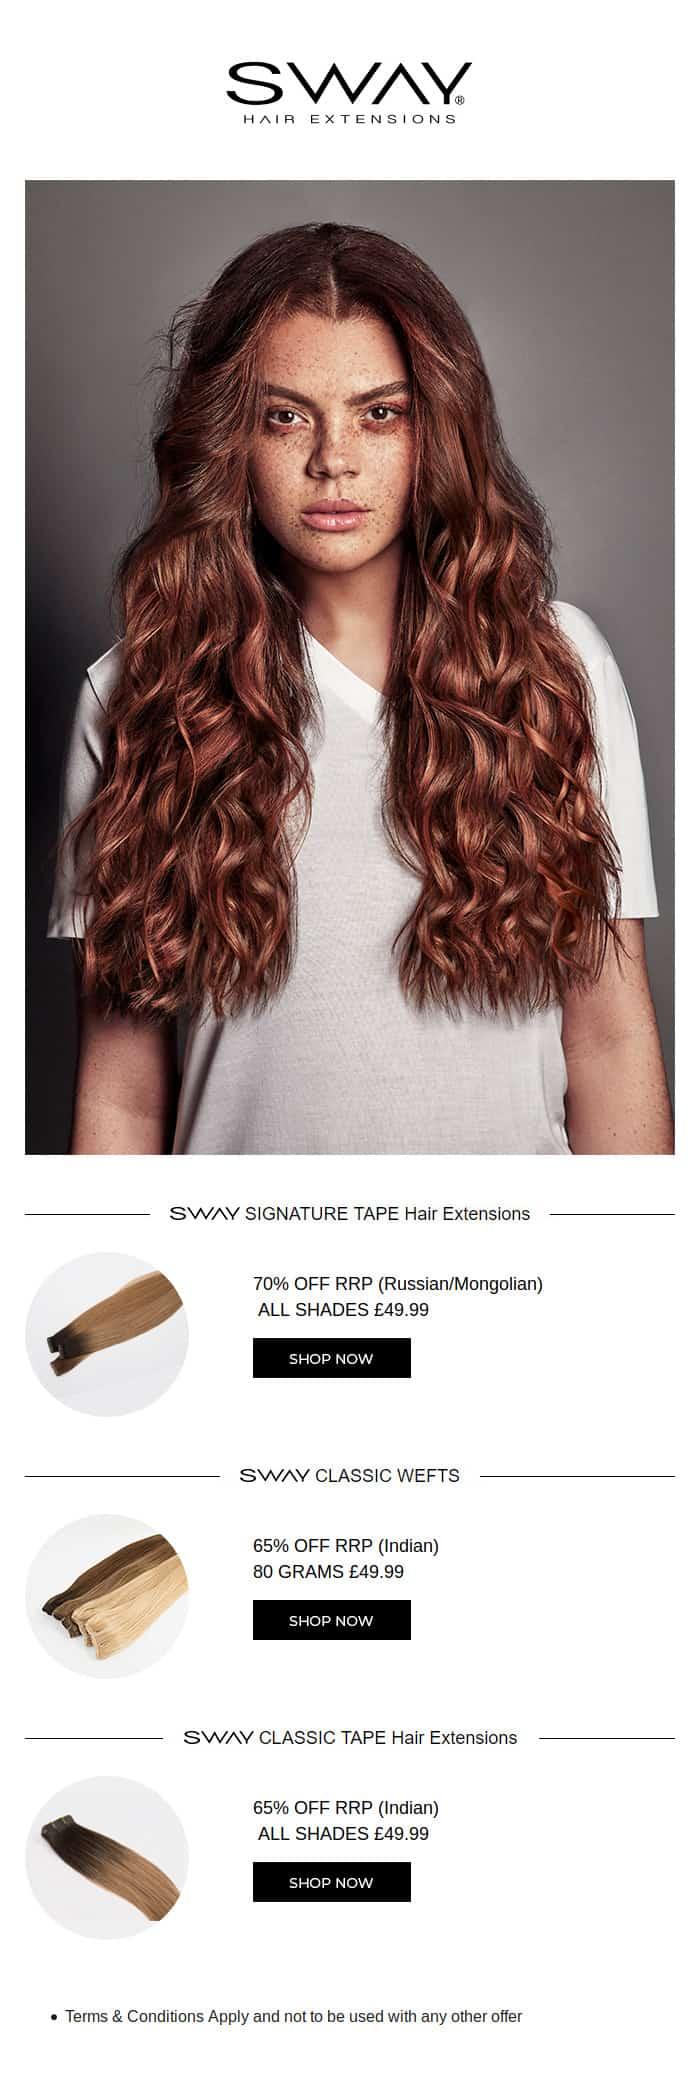 sway hair extensions